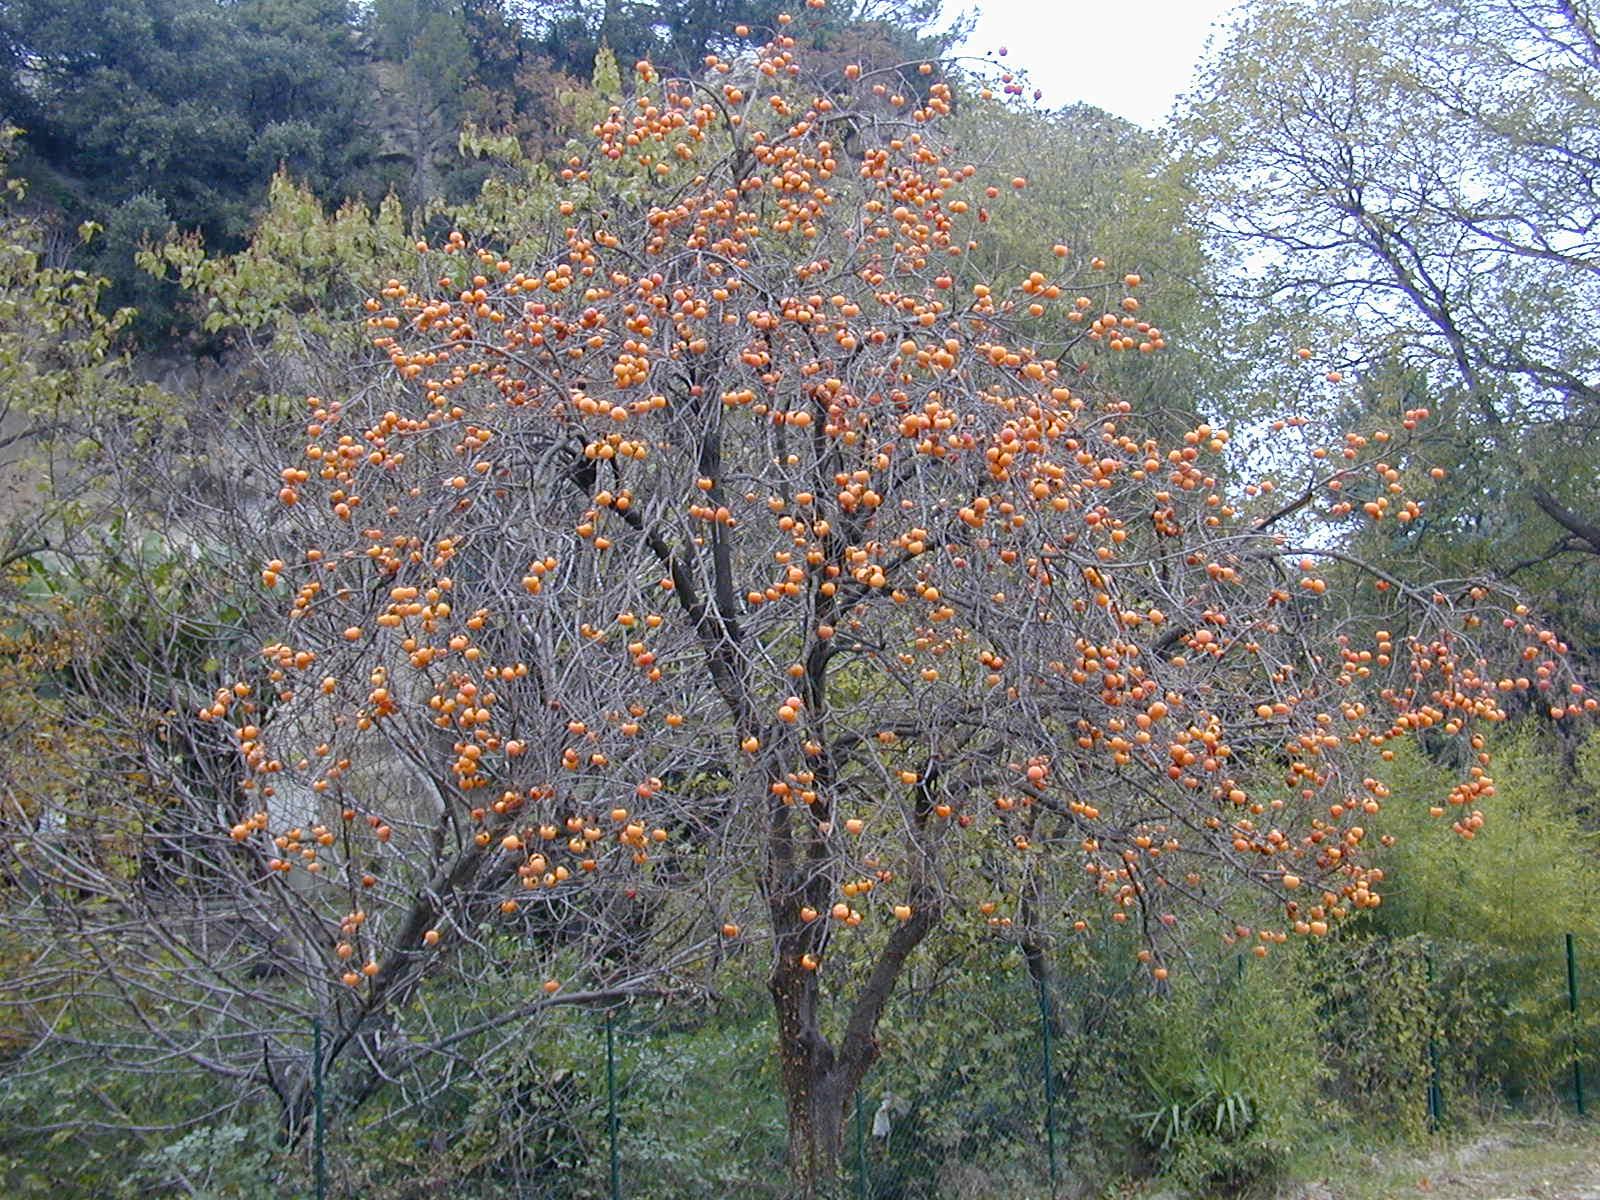 Ebenholzgew chse wikipedia for Arboles perennes en argentina